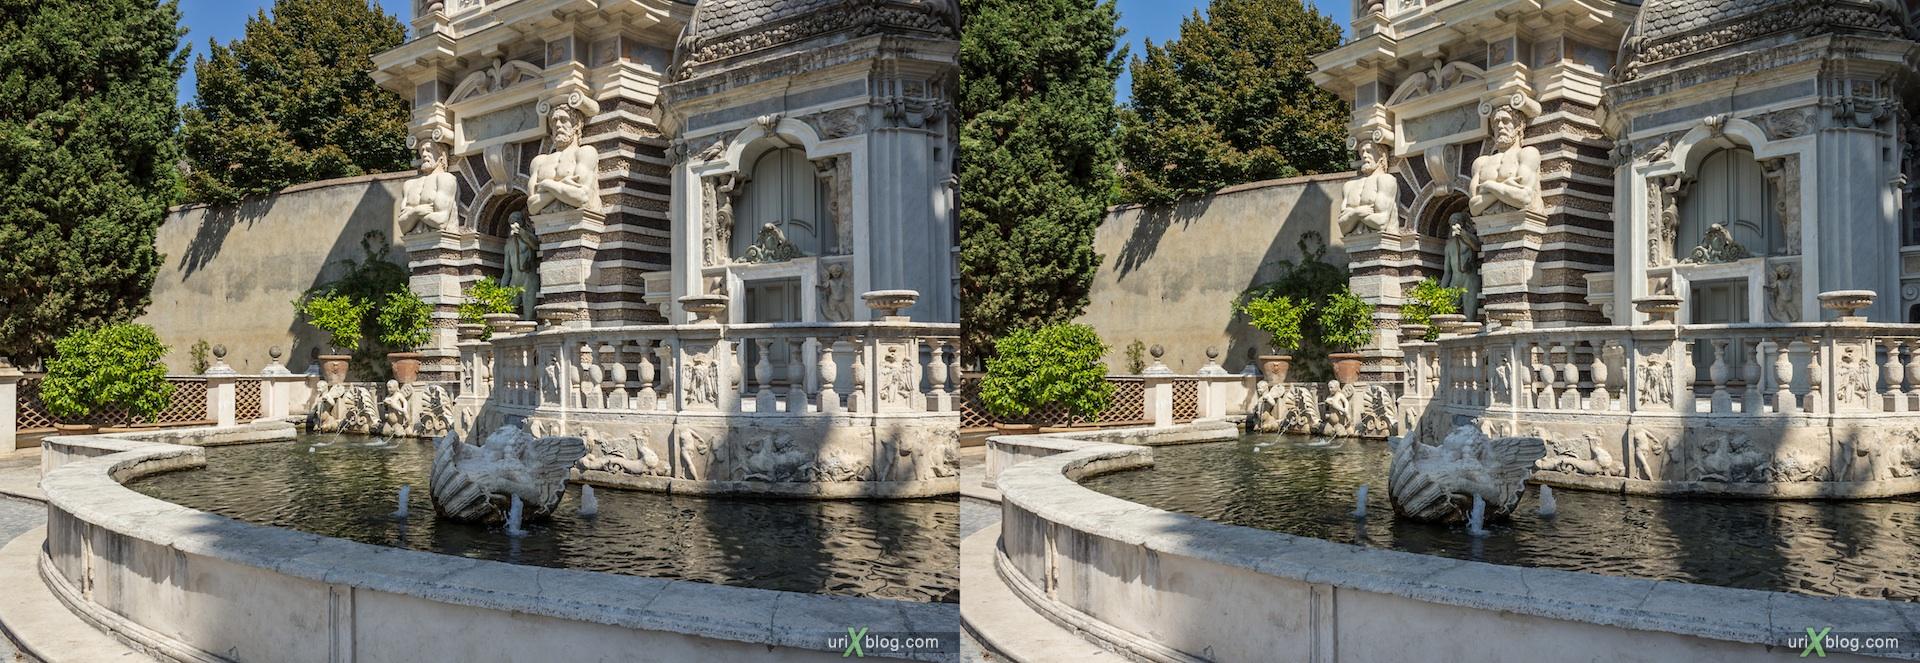 2012, Organ Fountain, Fontana dell'Organo, villa D'Este, Italy, Tivoli, Rome, 3D, stereo pair, cross-eyed, crossview, cross view stereo pair